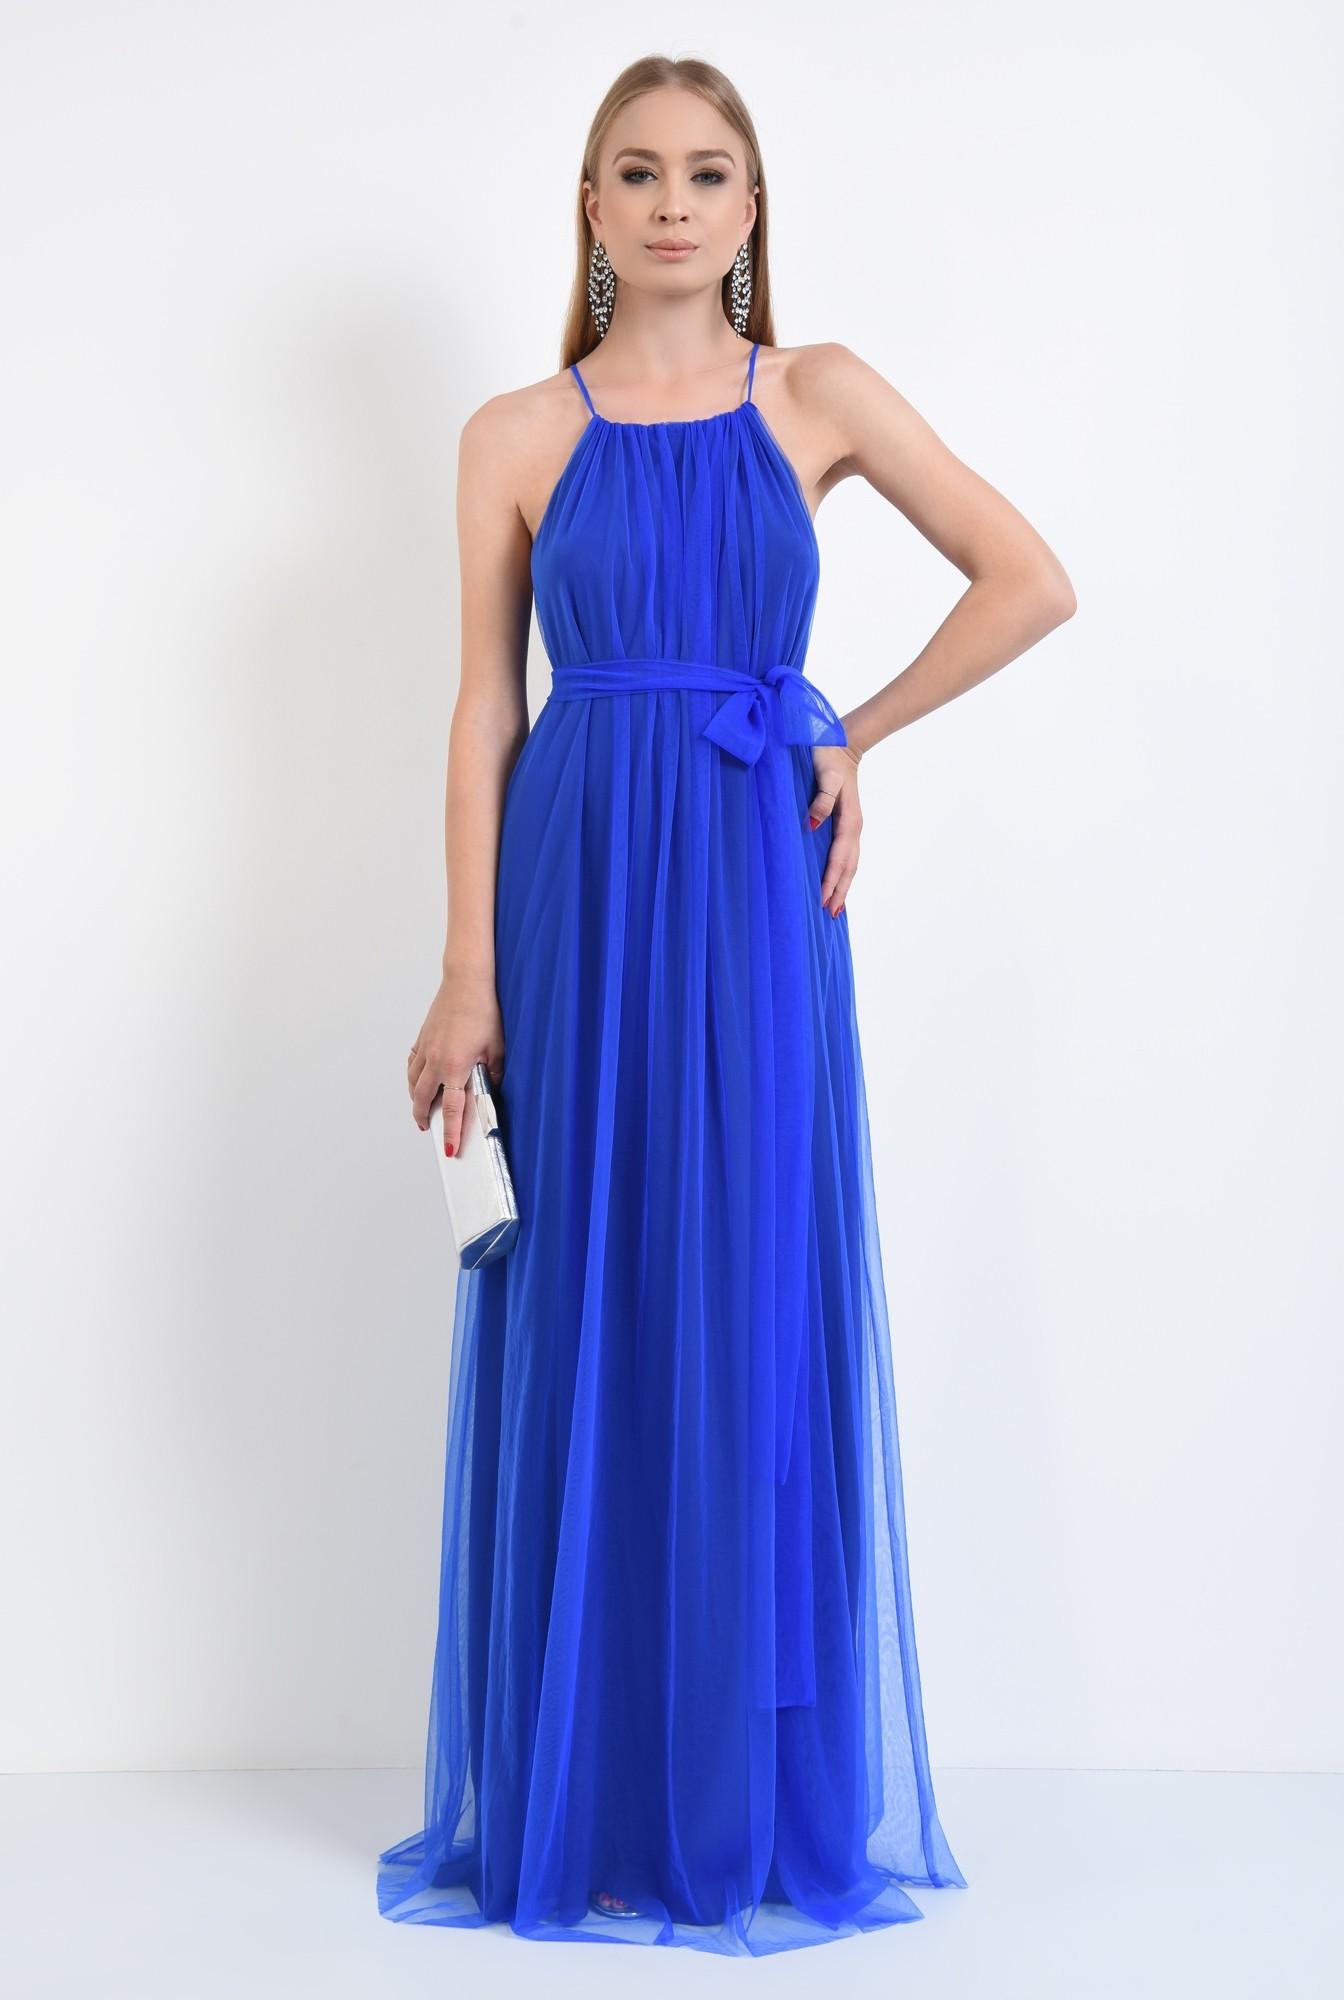 3 - rochie de ocazie, tul, lunga, albastru